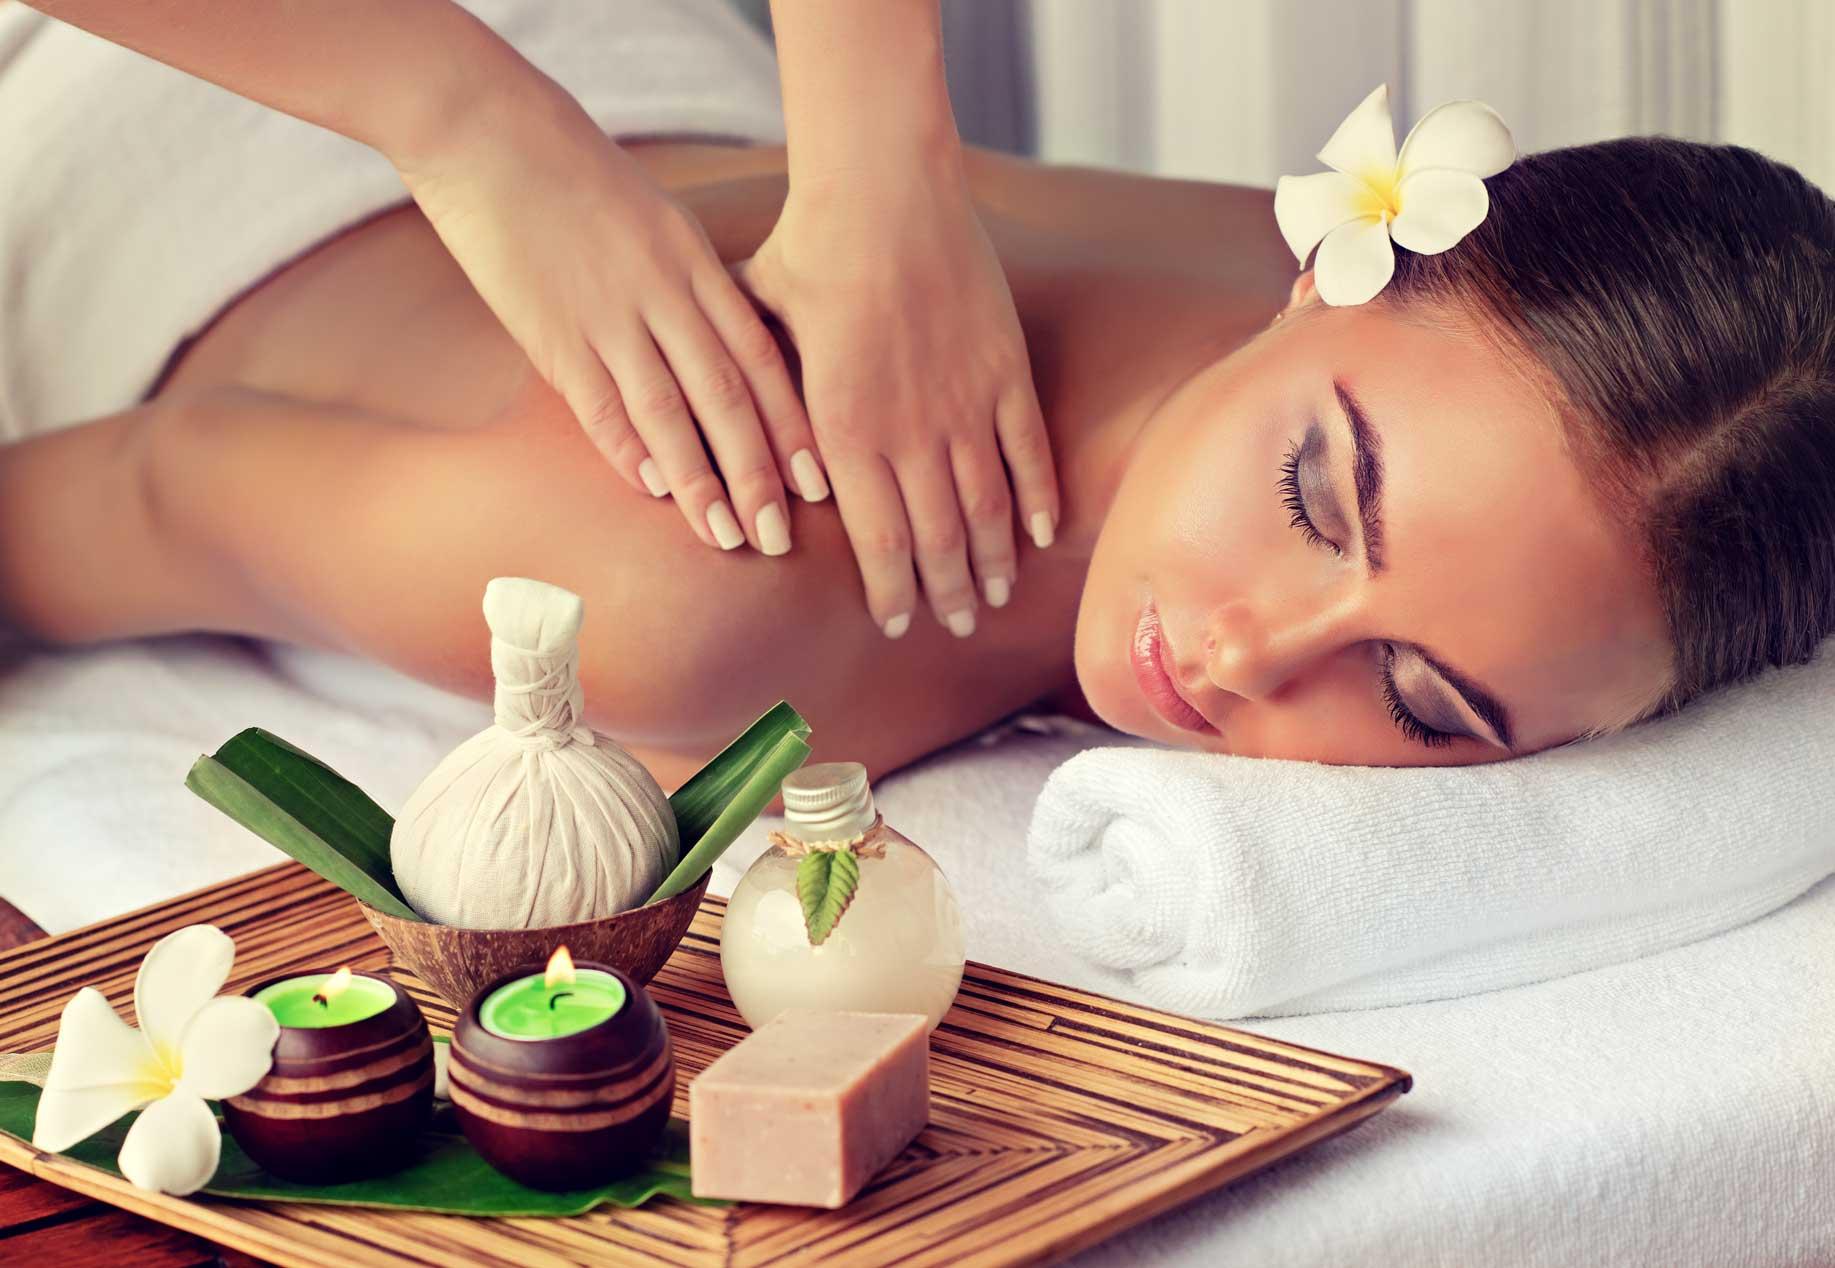 Female Massages